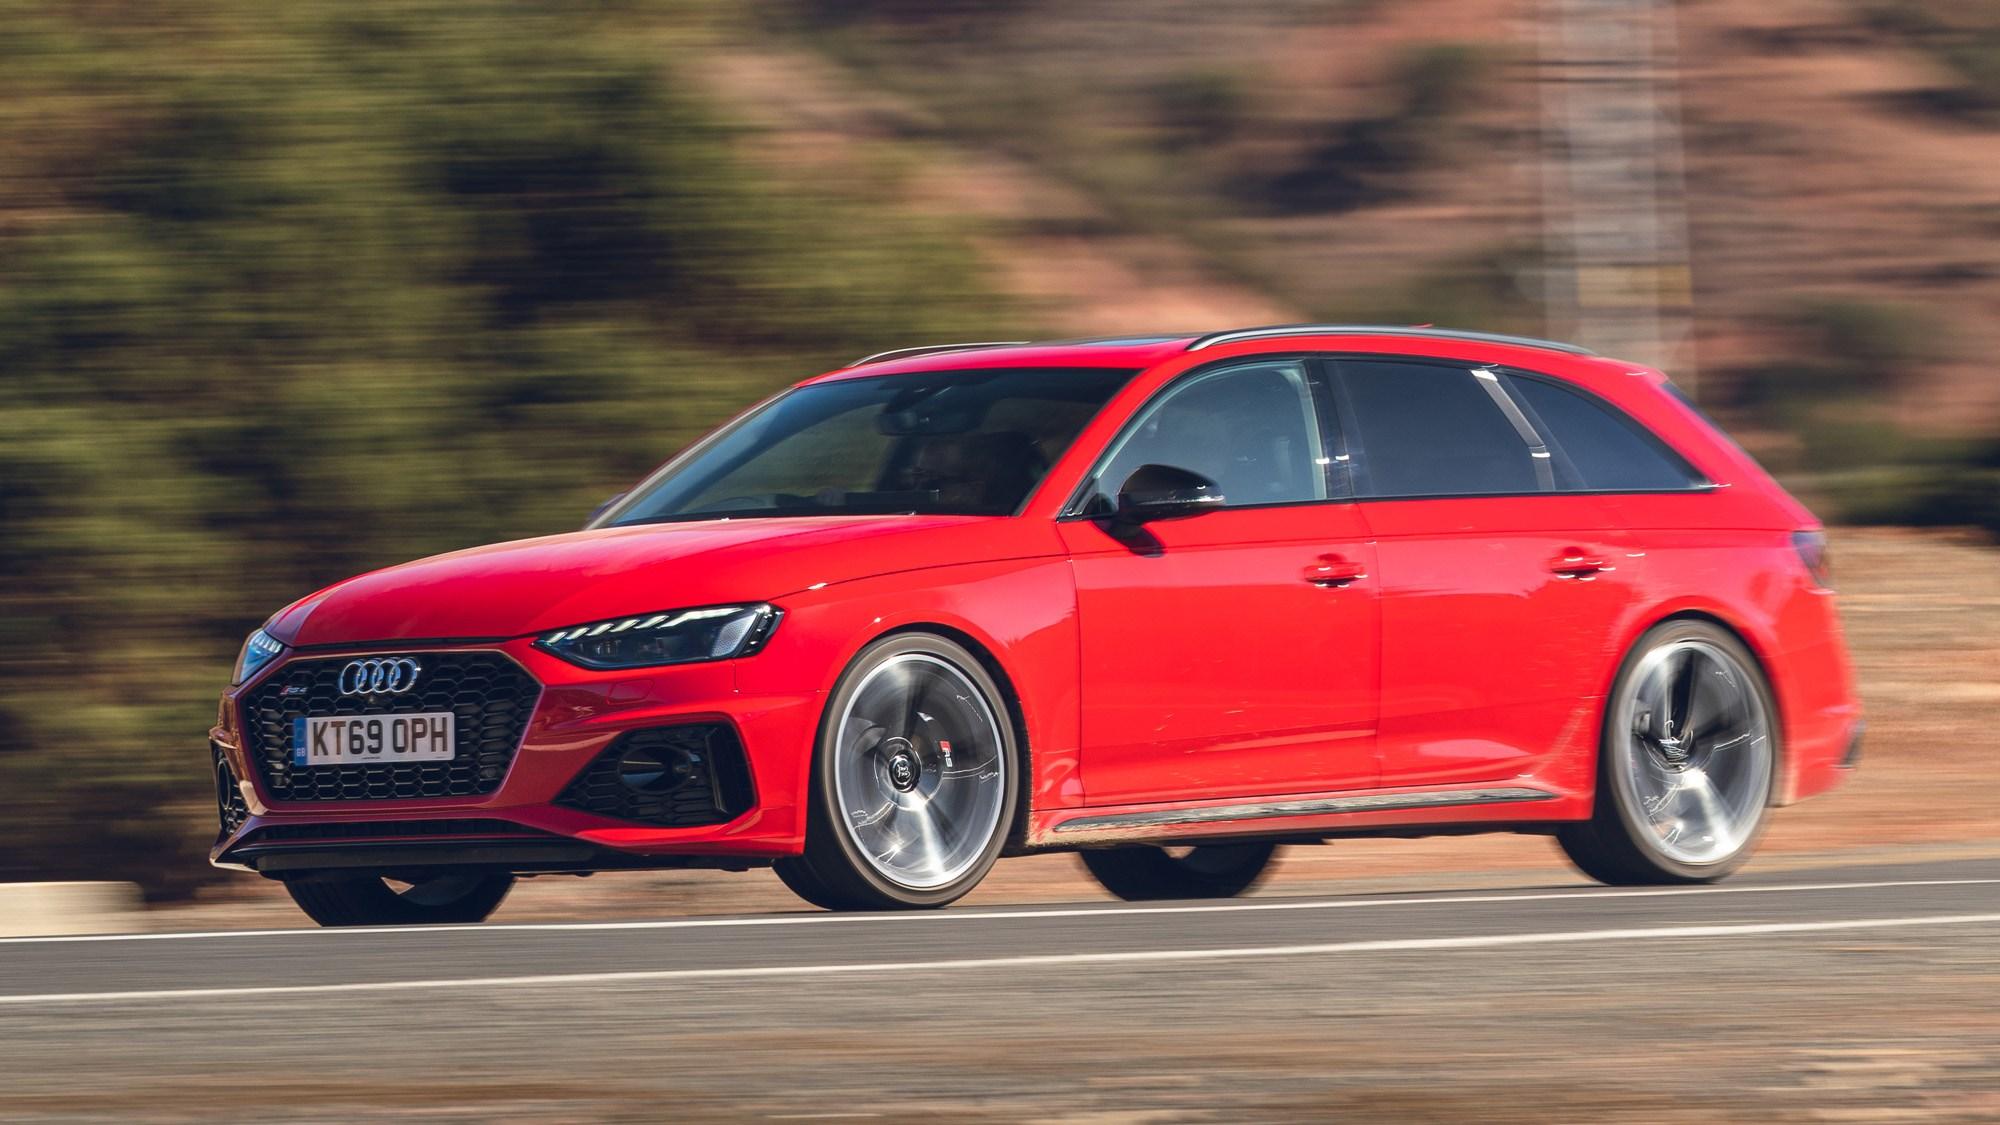 Kekurangan Audi A4 Rs Spesifikasi